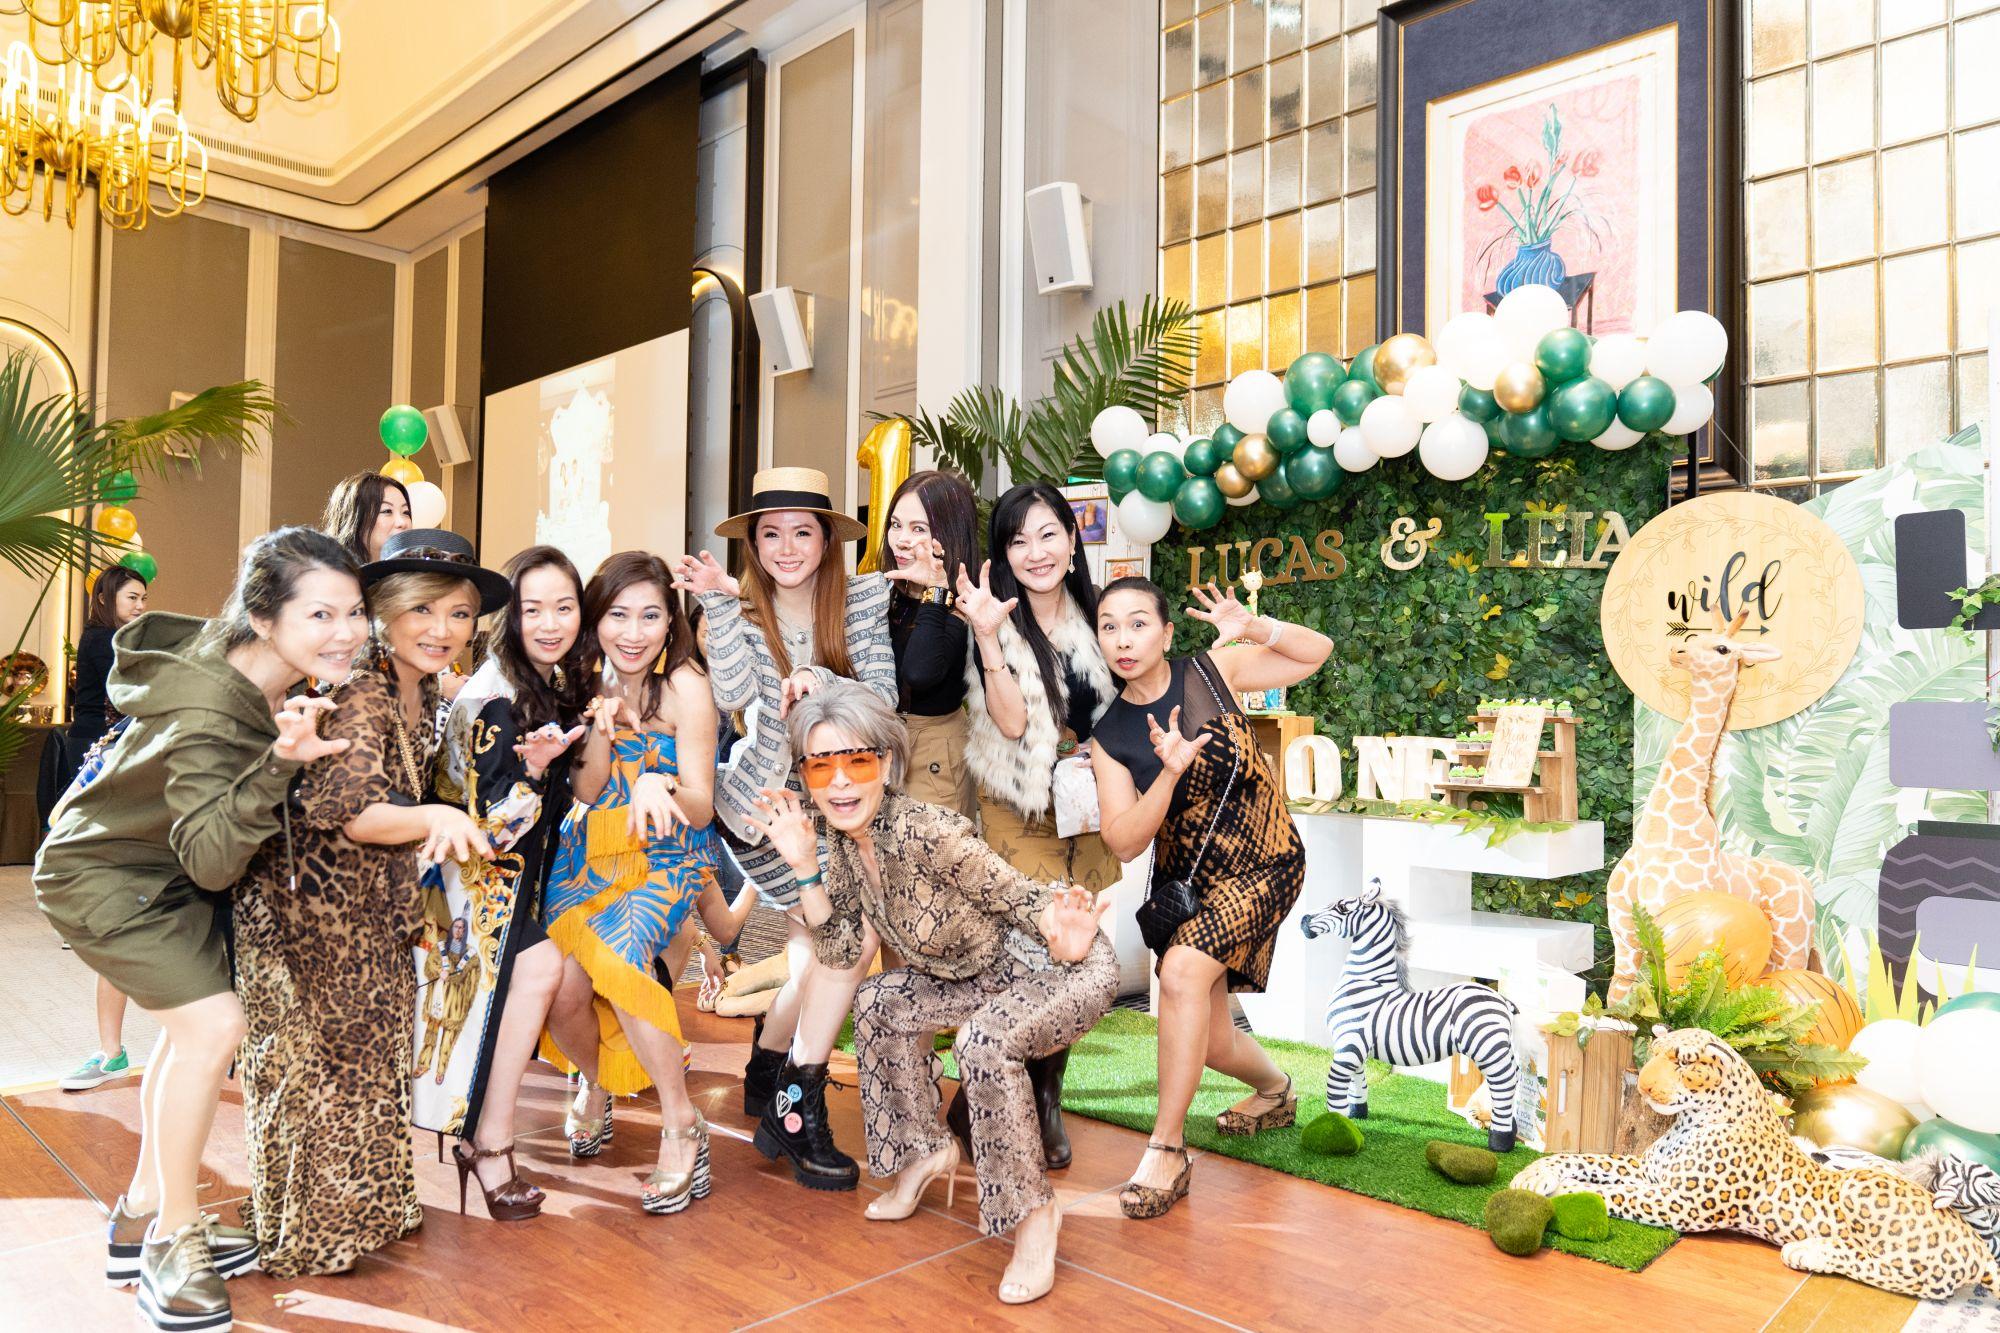 Kyoko Abe, Audrey Mico, Tonya Tan, Tan Khar Nai, Chermaine Pang, Grace Wong, Jacelyn Lai, Dawn Yip